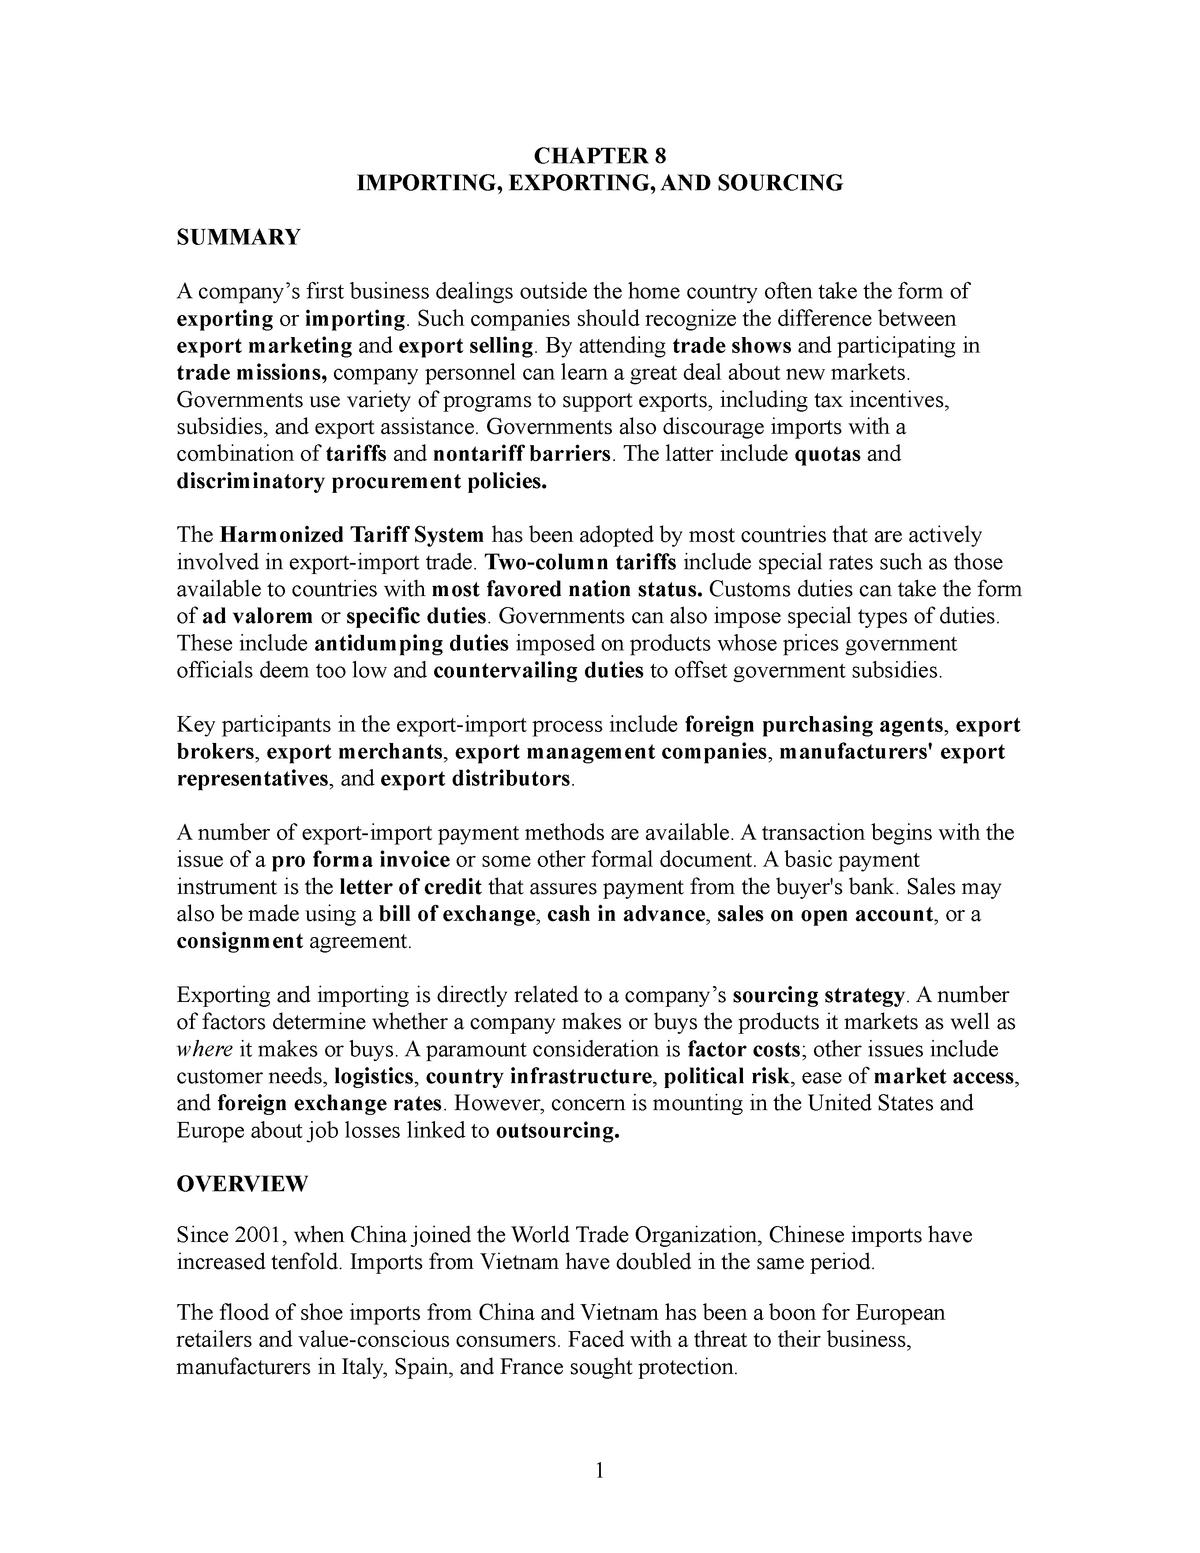 Summary ch 8 - course - Marketing internaţional International